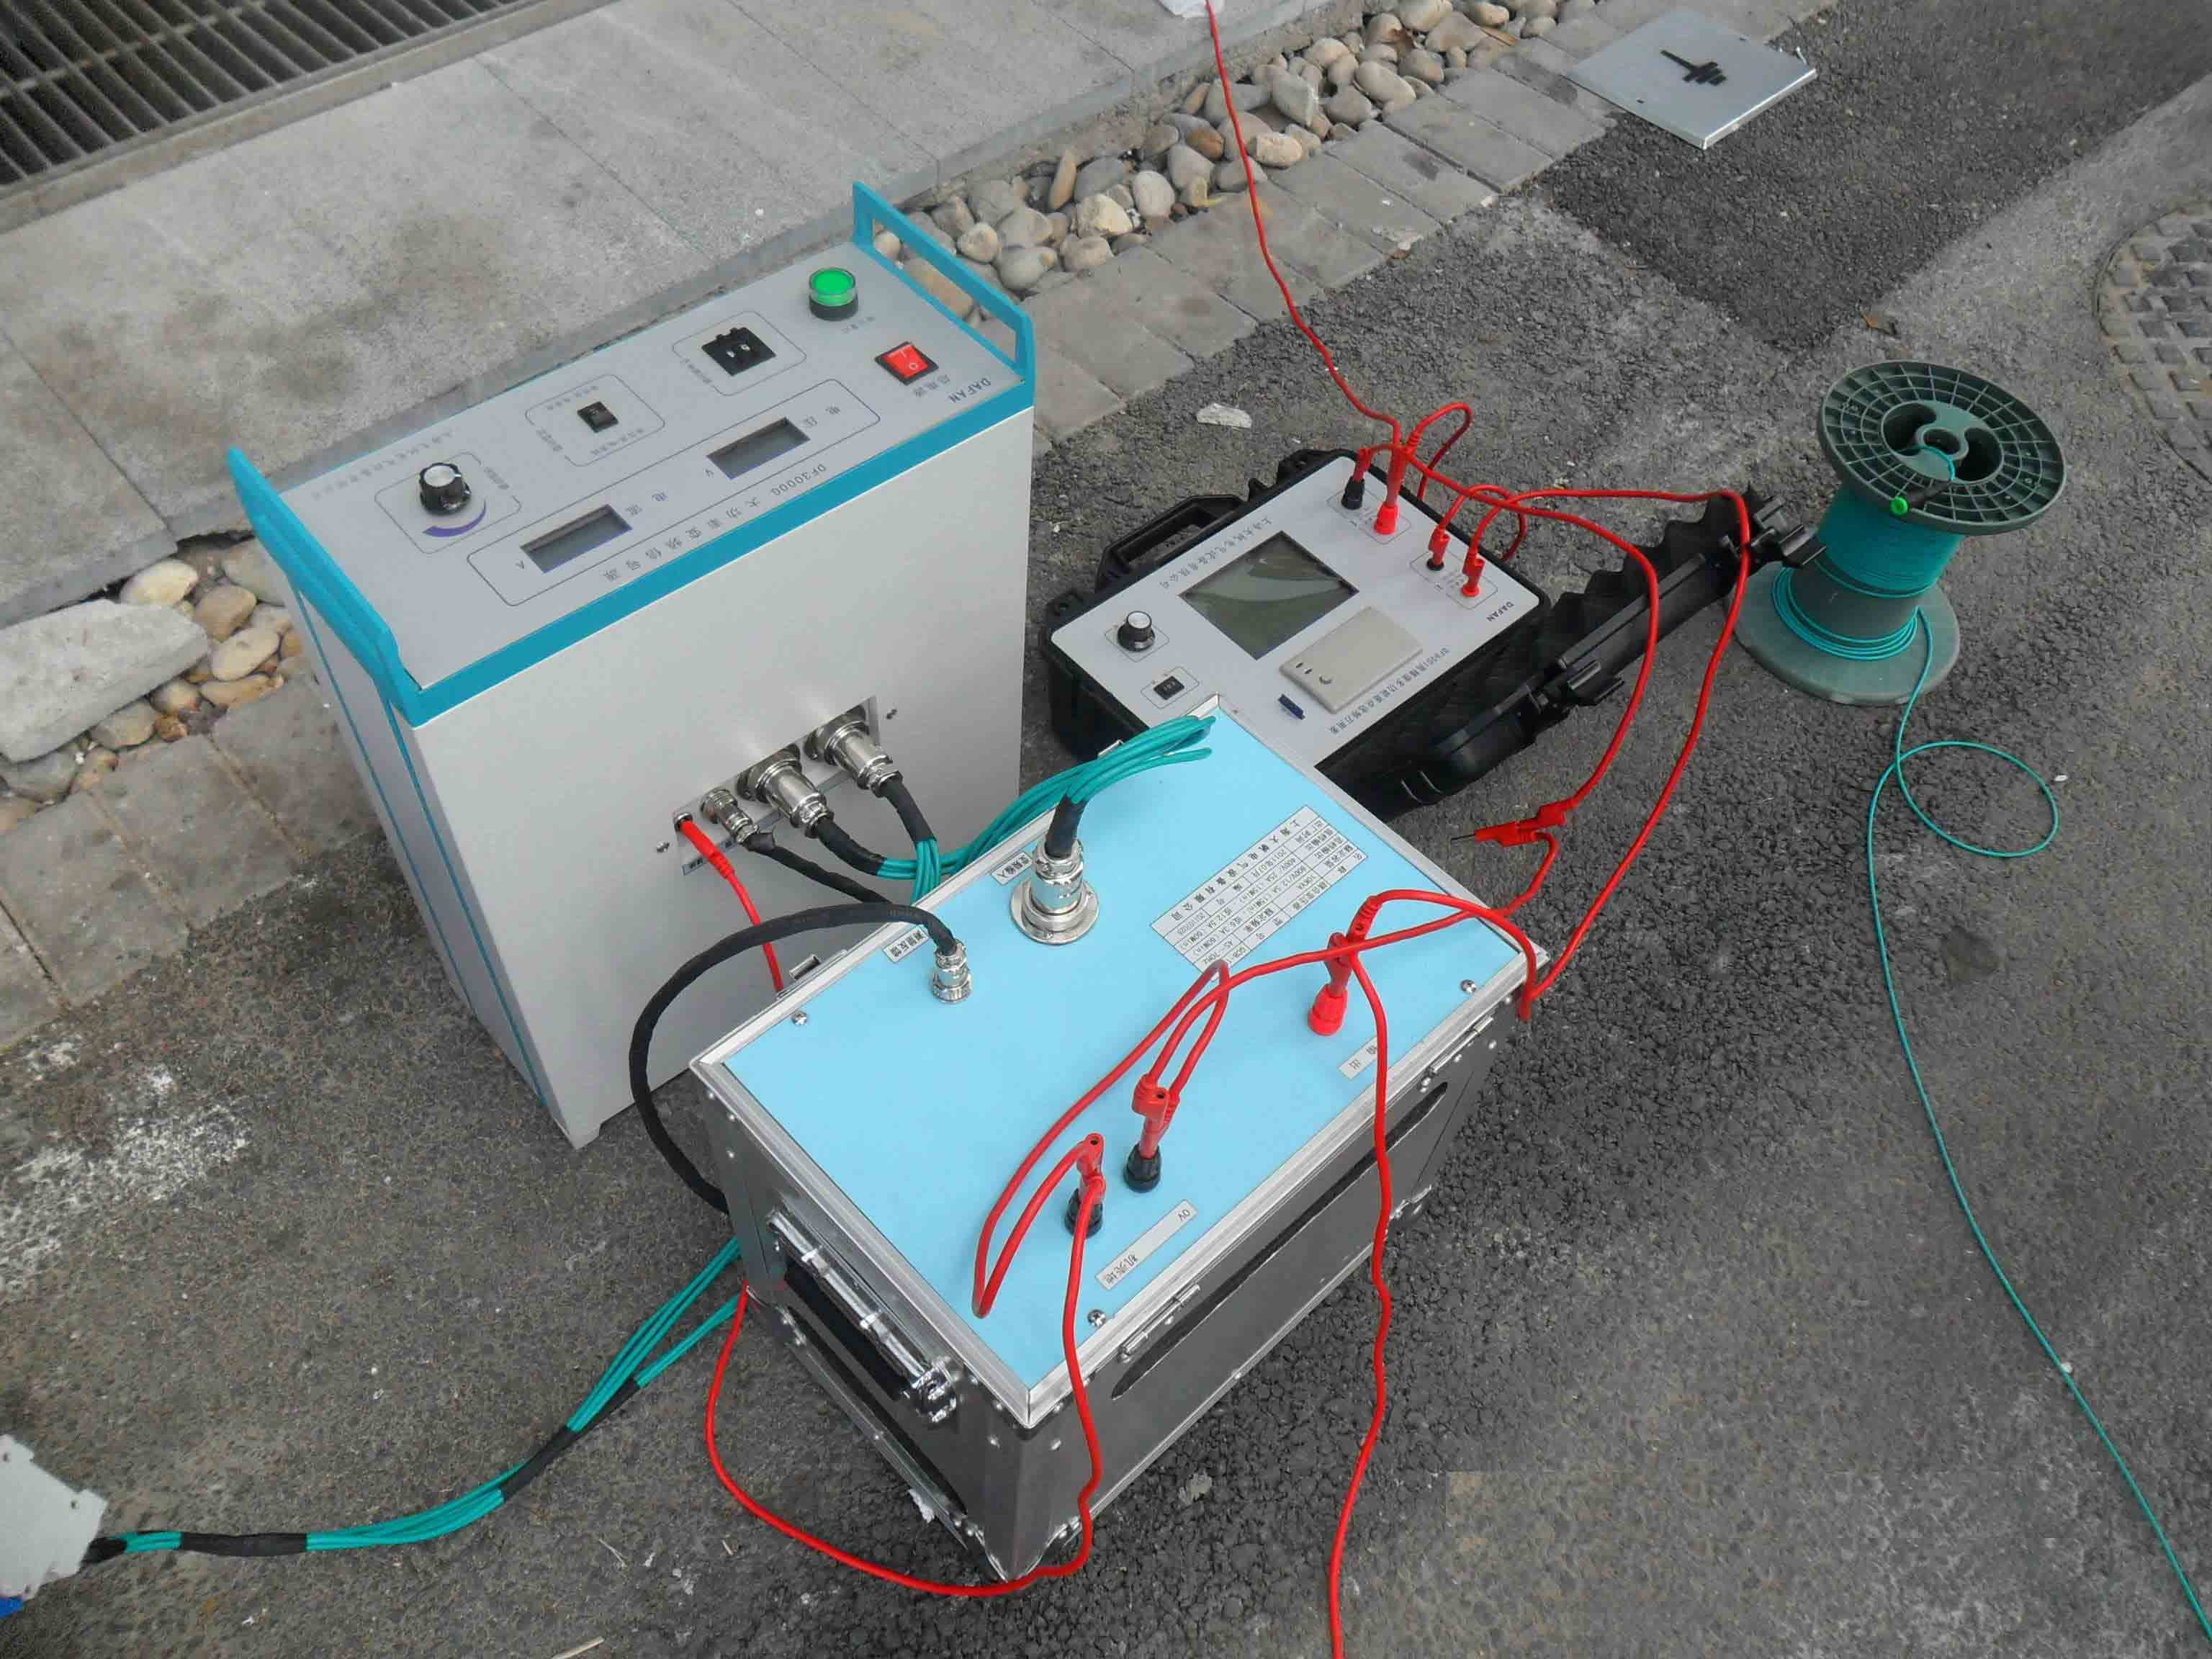 接地电阻测量仪; 大型地网接地电阻测量仪;